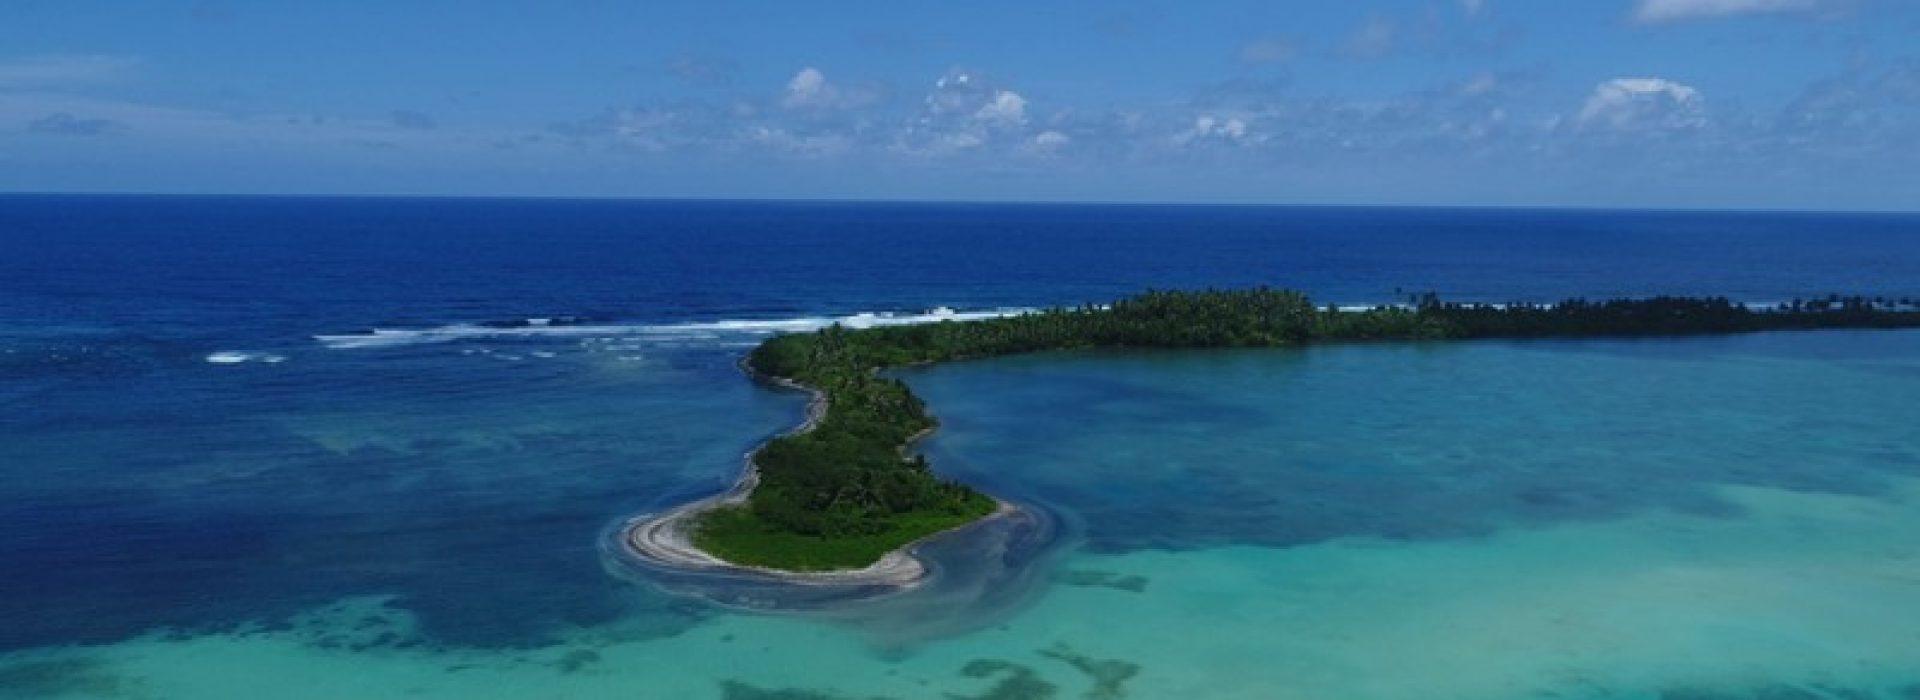 SkyEye Pacific